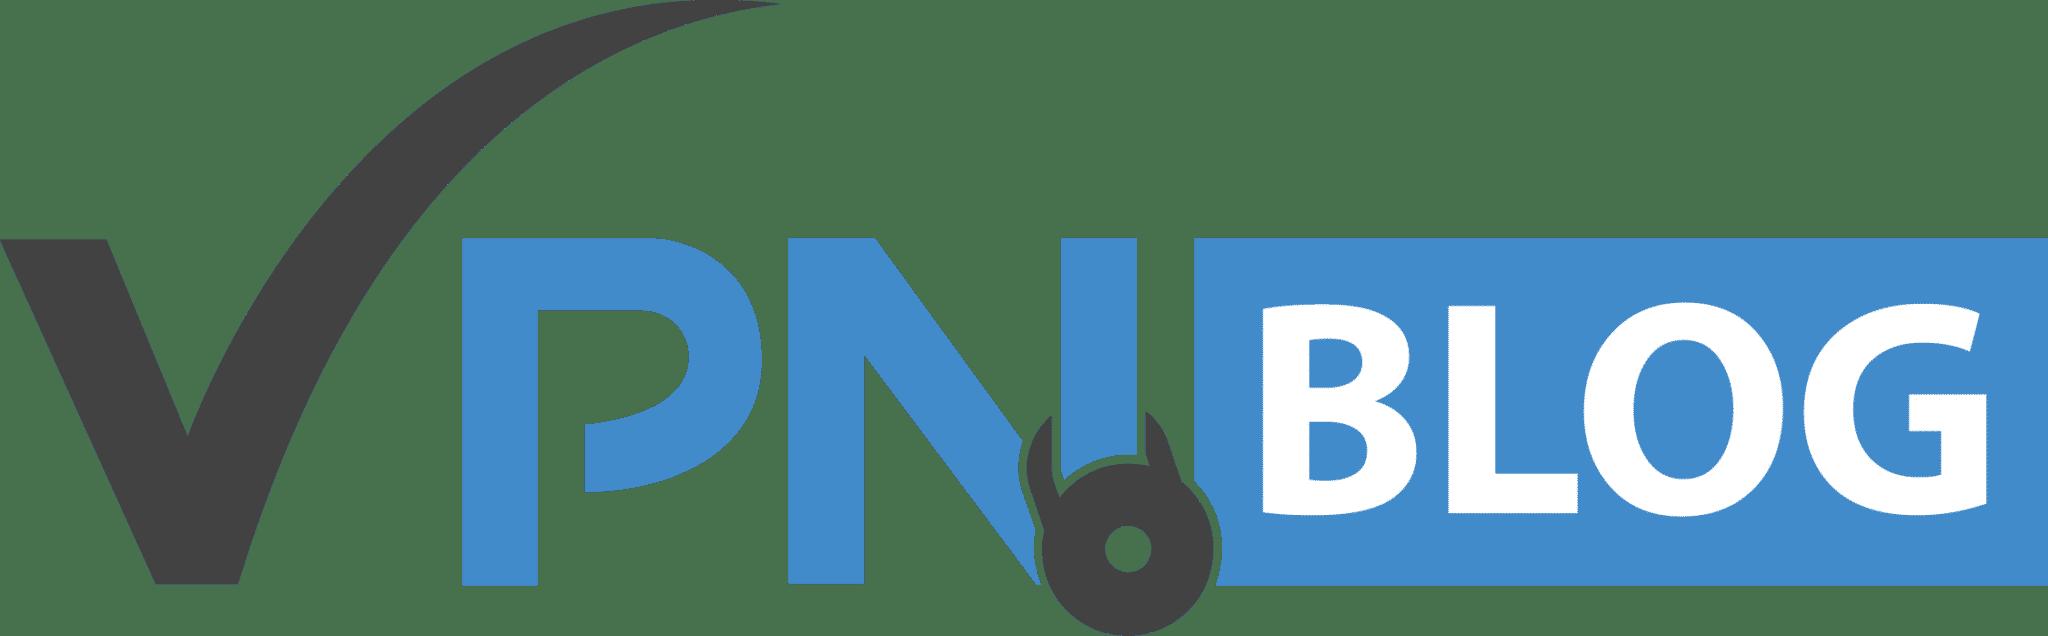 VPN-Blog